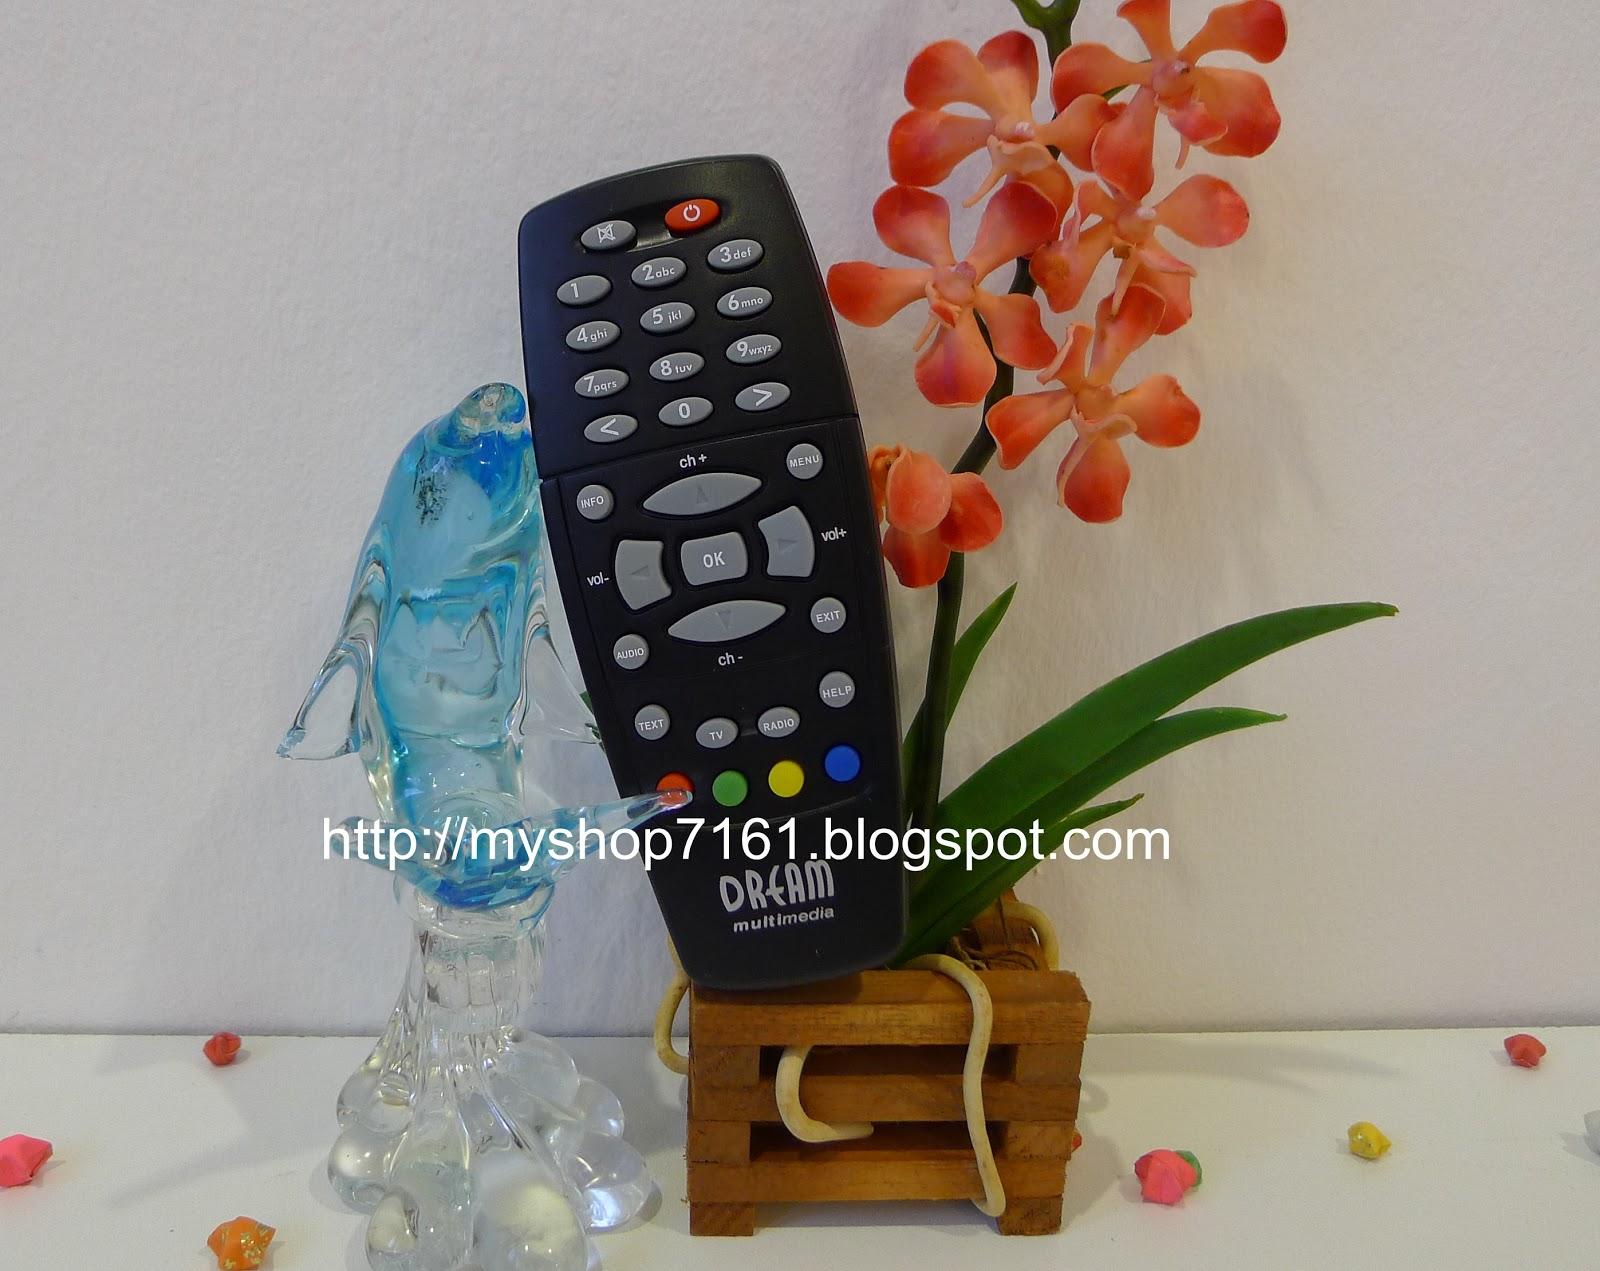 My Shop: Dreambox Satellite Receiver DM500s / DM518s